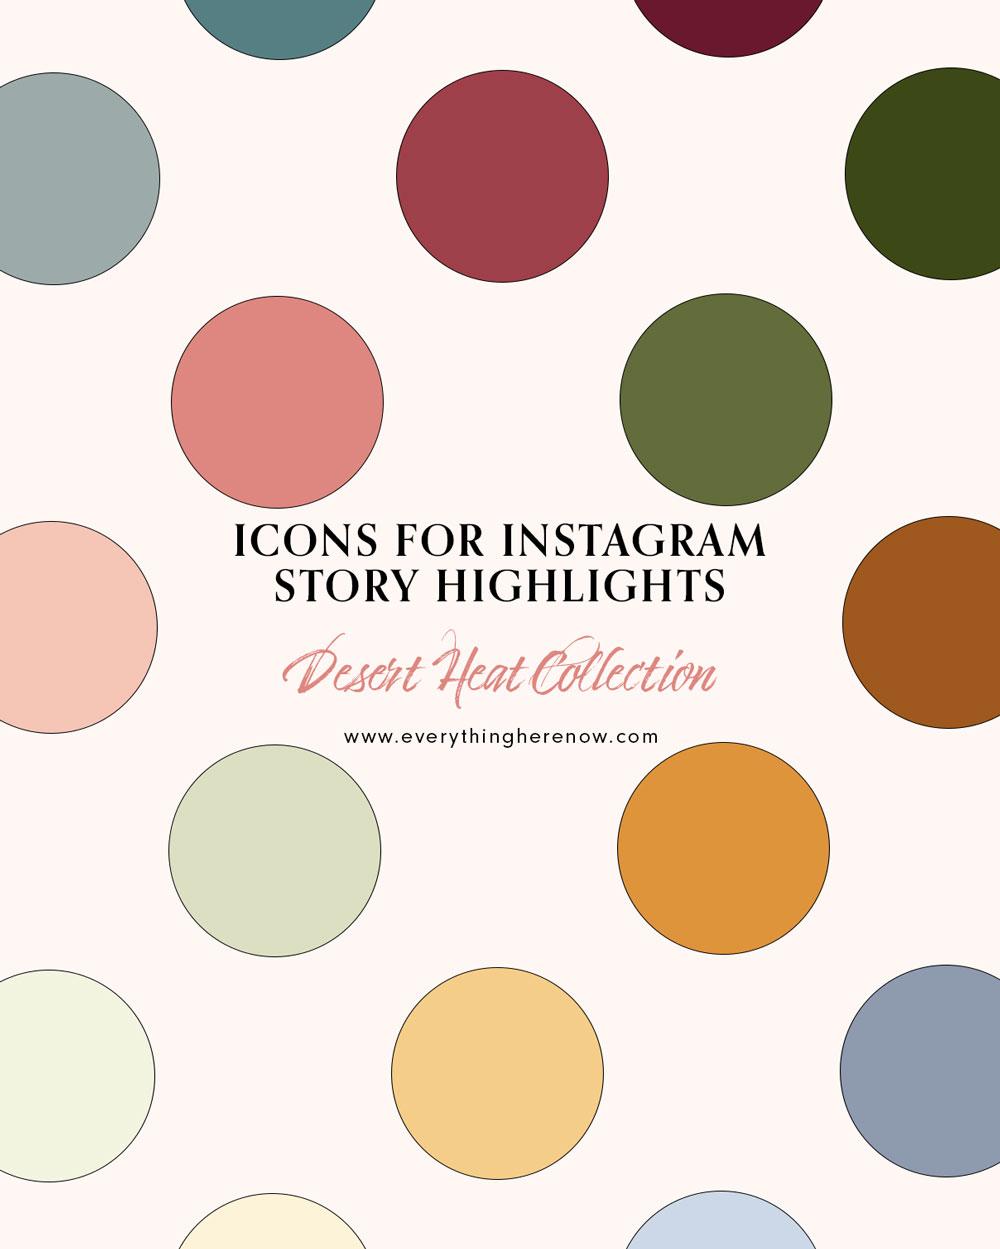 Icons for Instagram Story Highlights: Desert Heat Collection #instagram #instagramhighlights #icons Icons for Instagram Story Highlights: Desert Heat Collection #instagram #instagramhighlights #icons https://everythingherenow.com/shop/